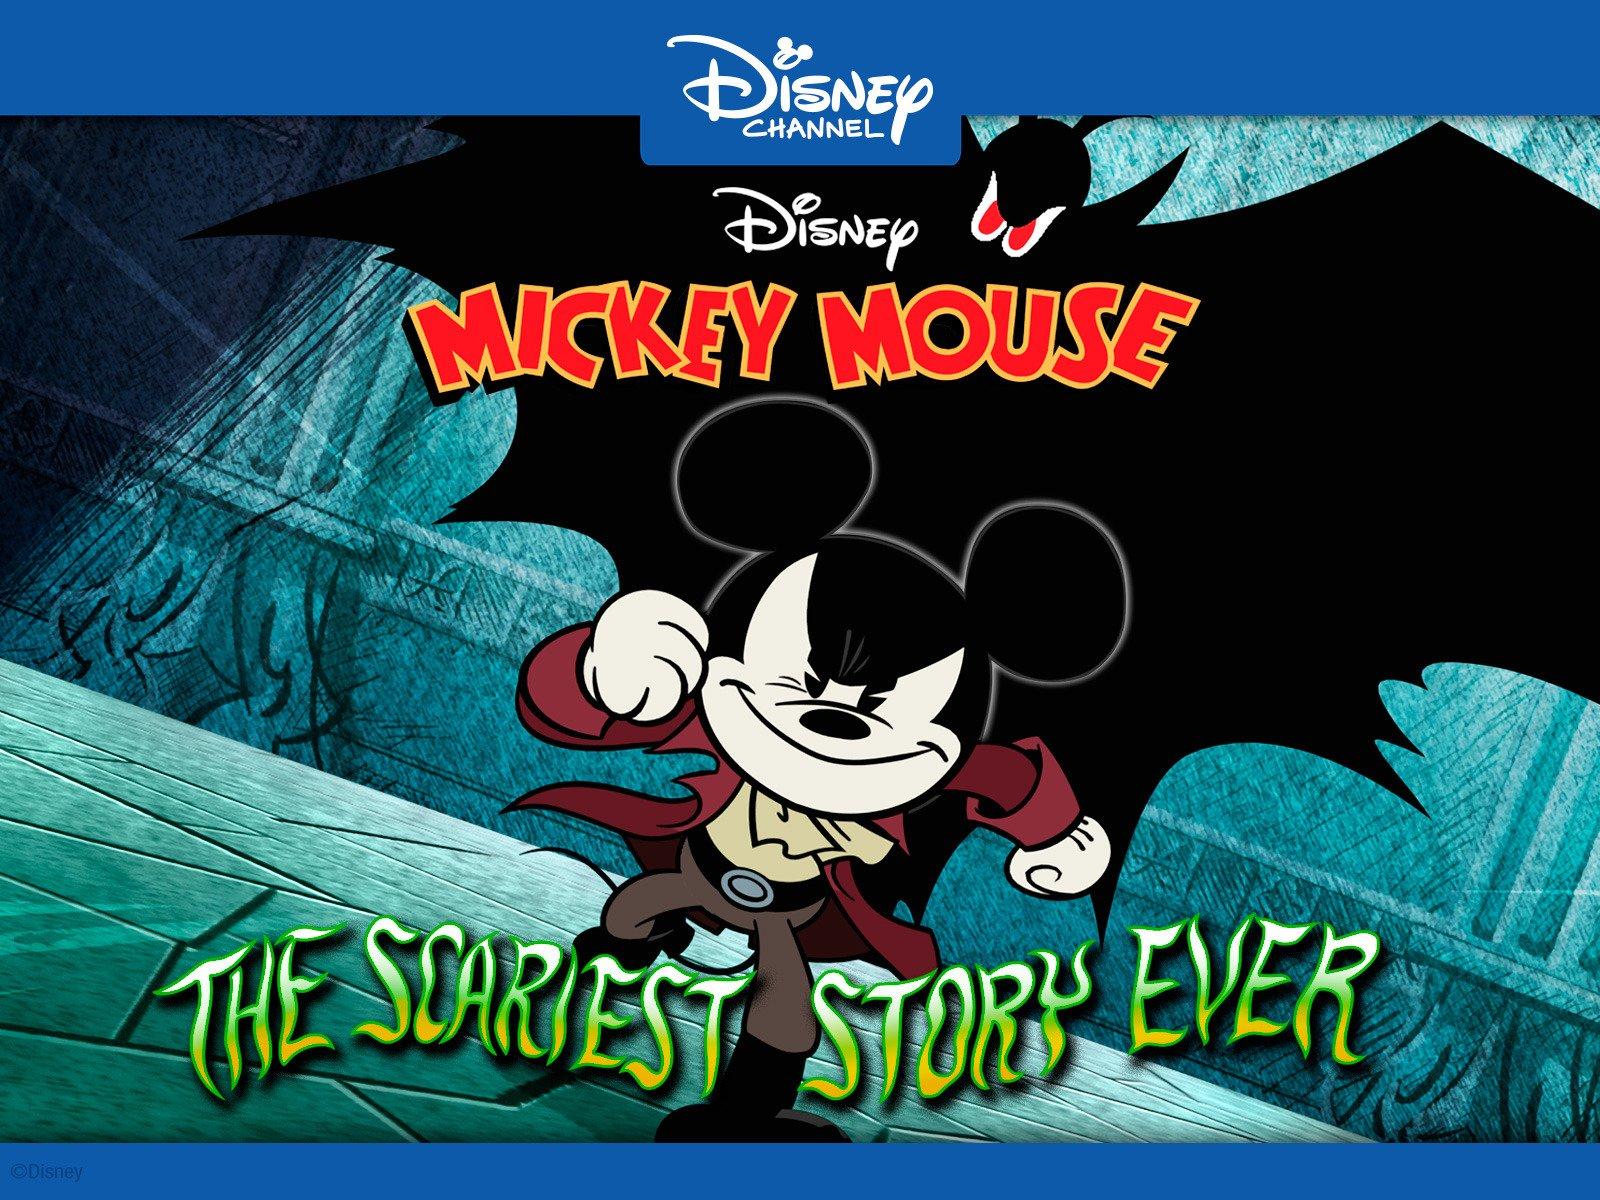 photo Disturbing Friday Fun: Nightmarish Mickey Mouse